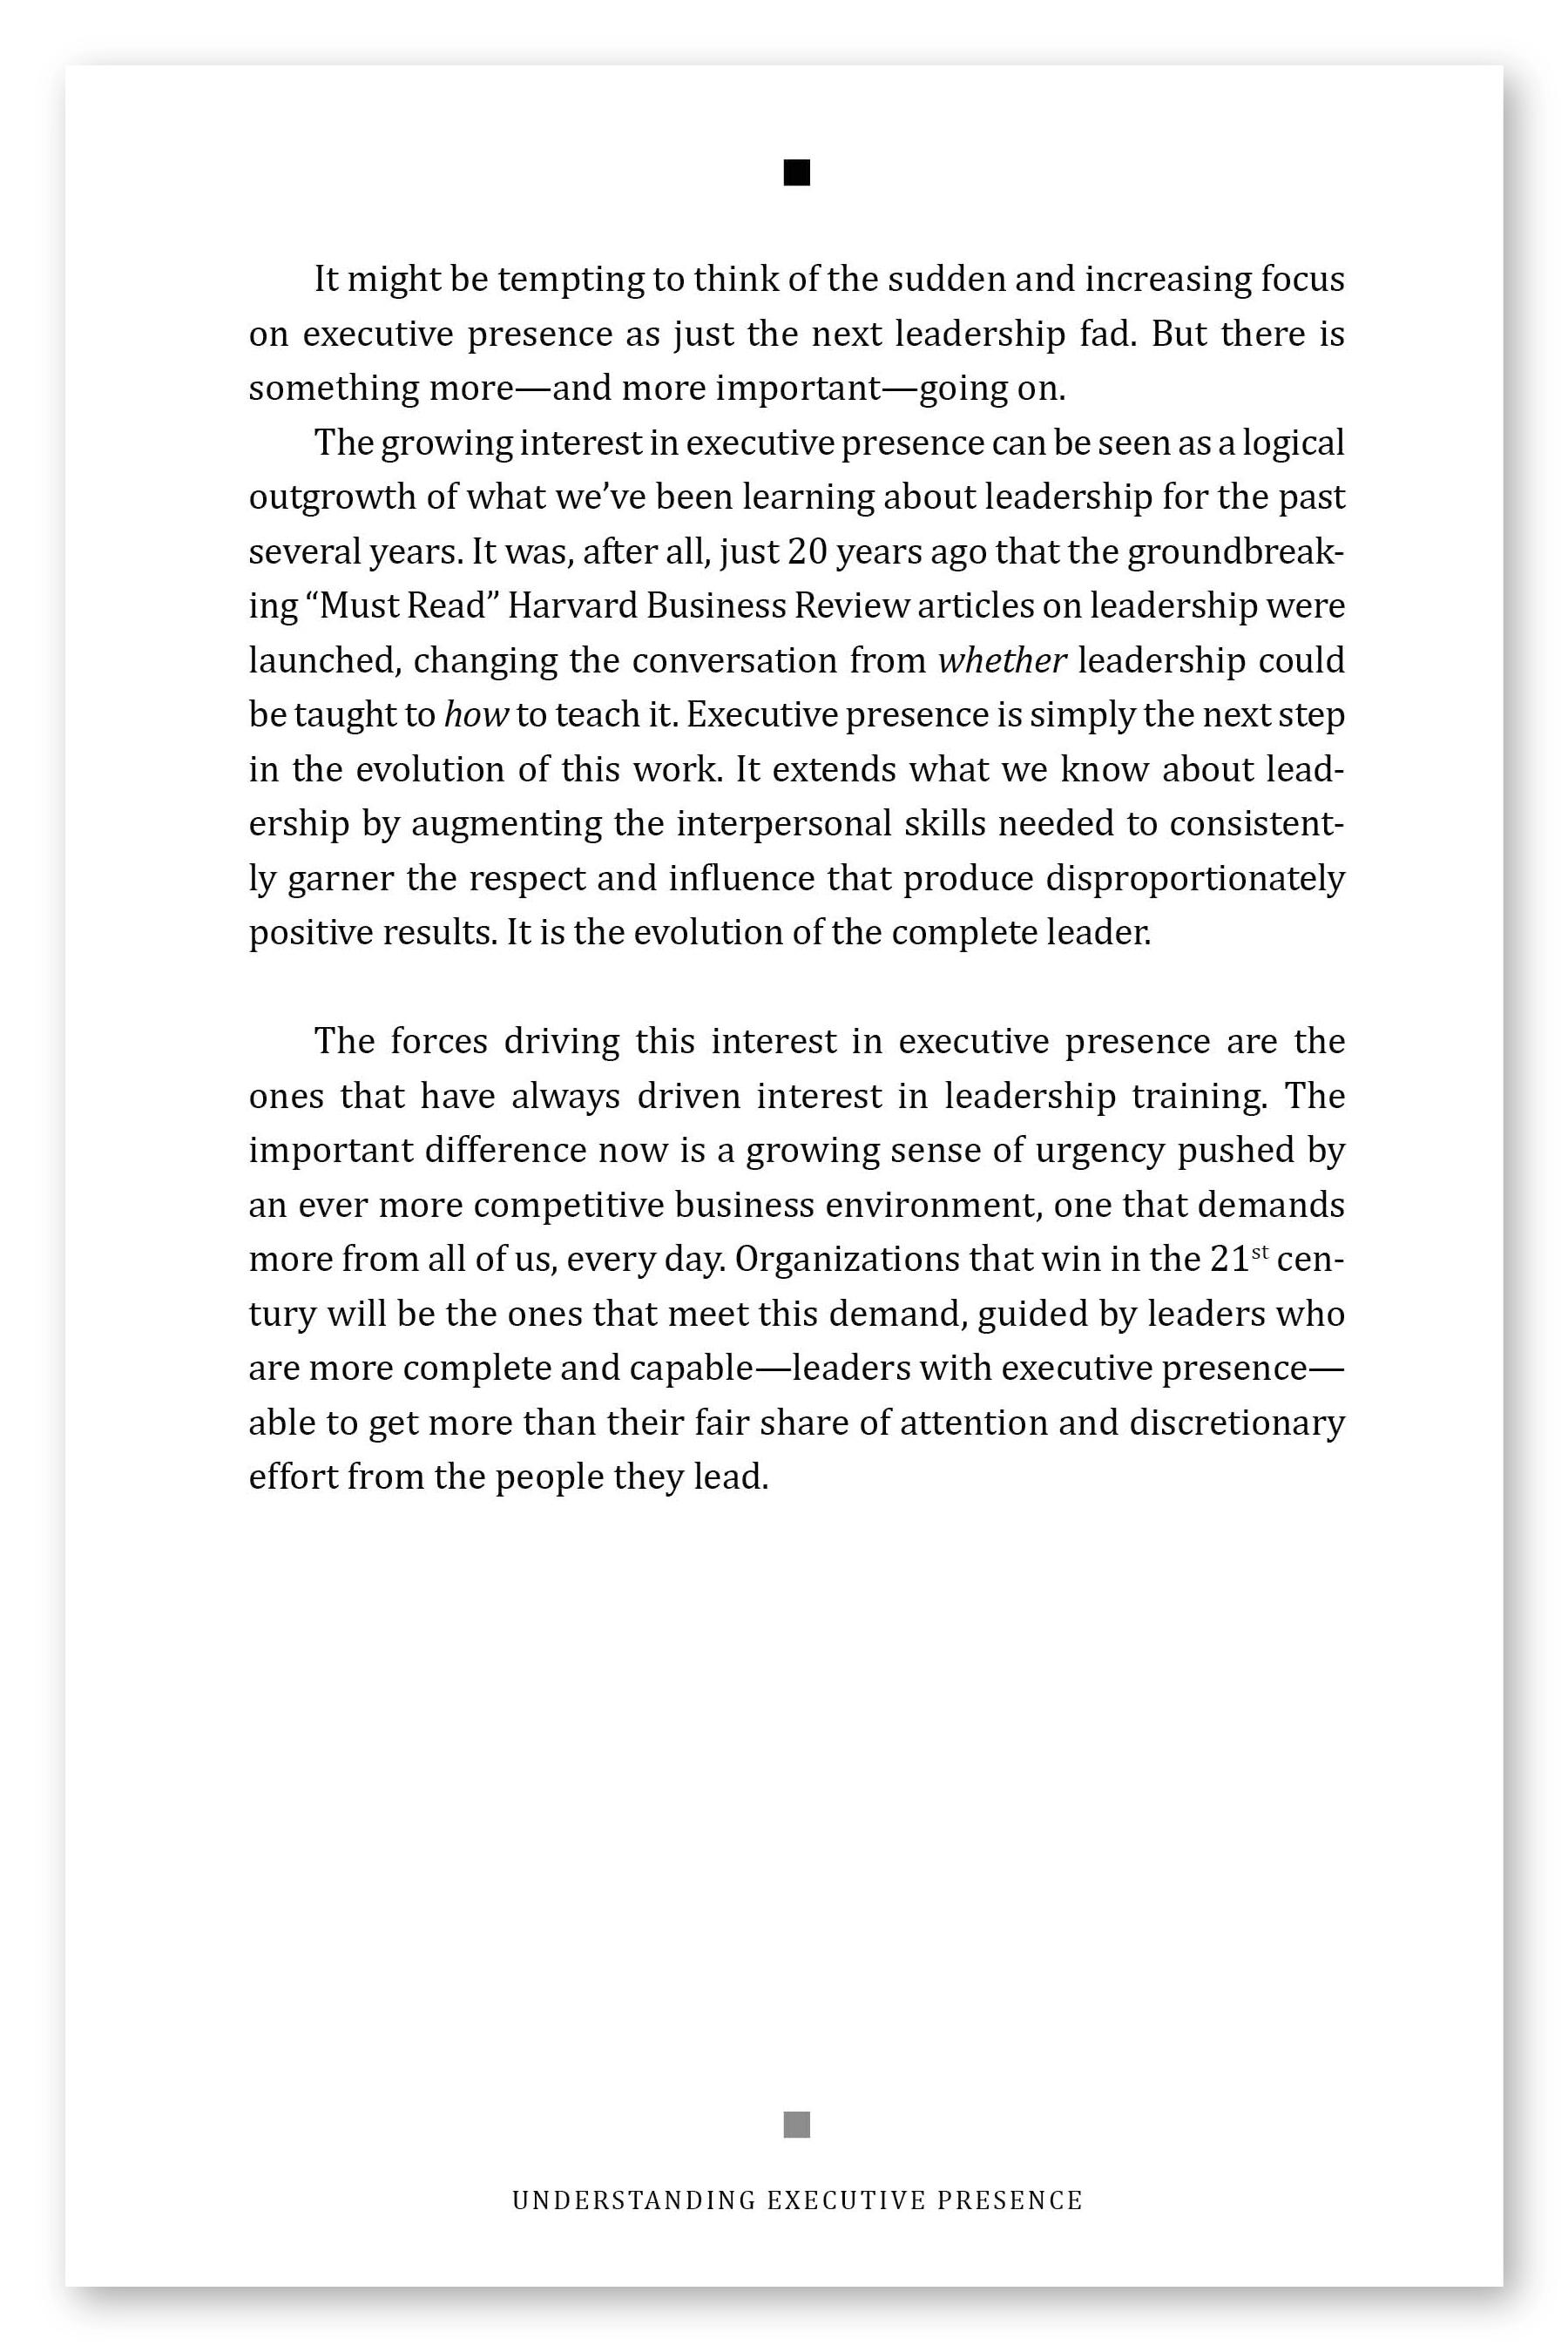 UEP Amazon Pages-03.jpg